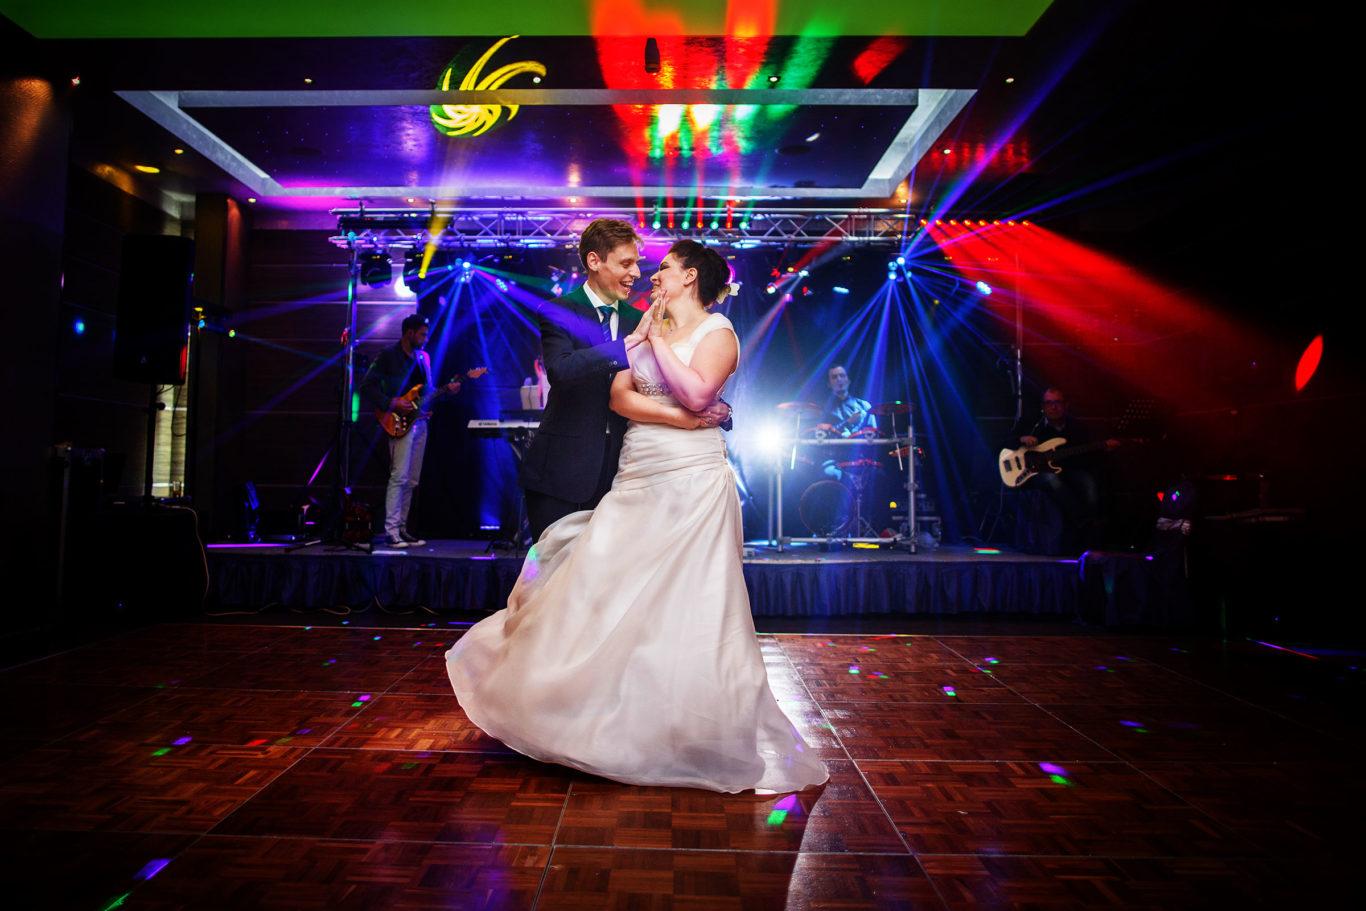 0408-Fotografie-nunta-Roxana-Costin-fotograf-Ciprian-Dumitrescu-DCF_6228